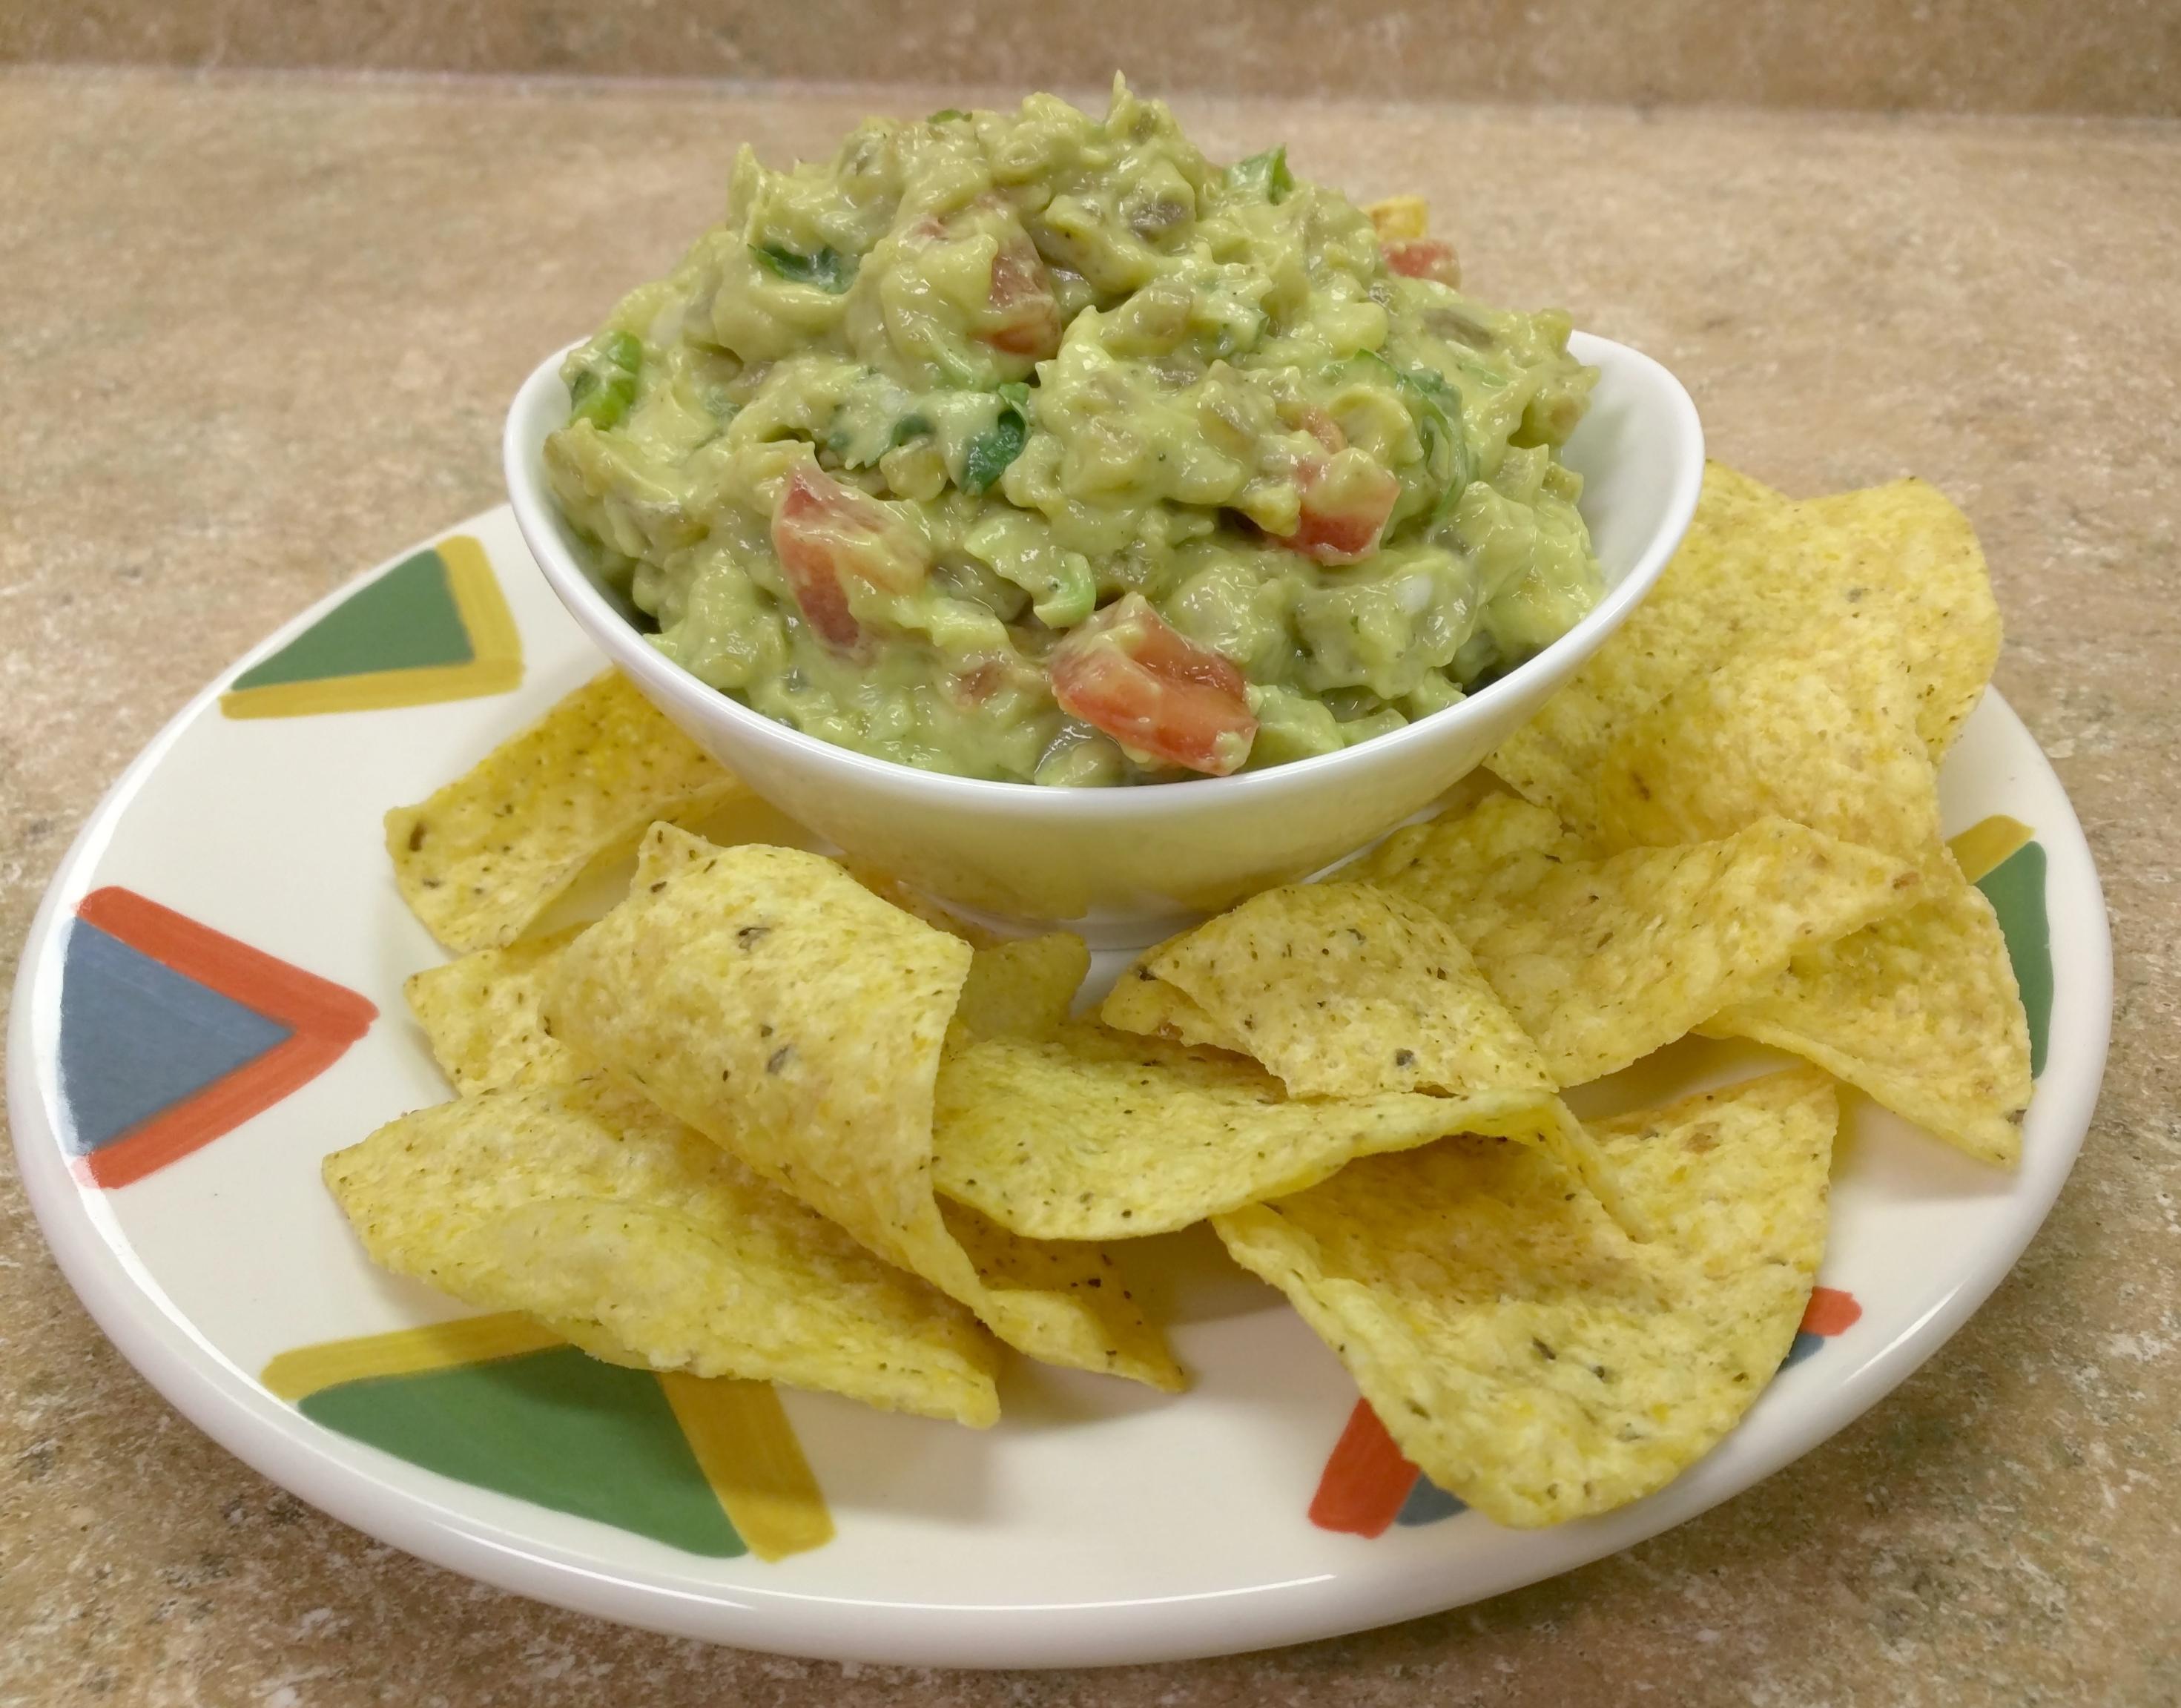 how to make guacamole dip